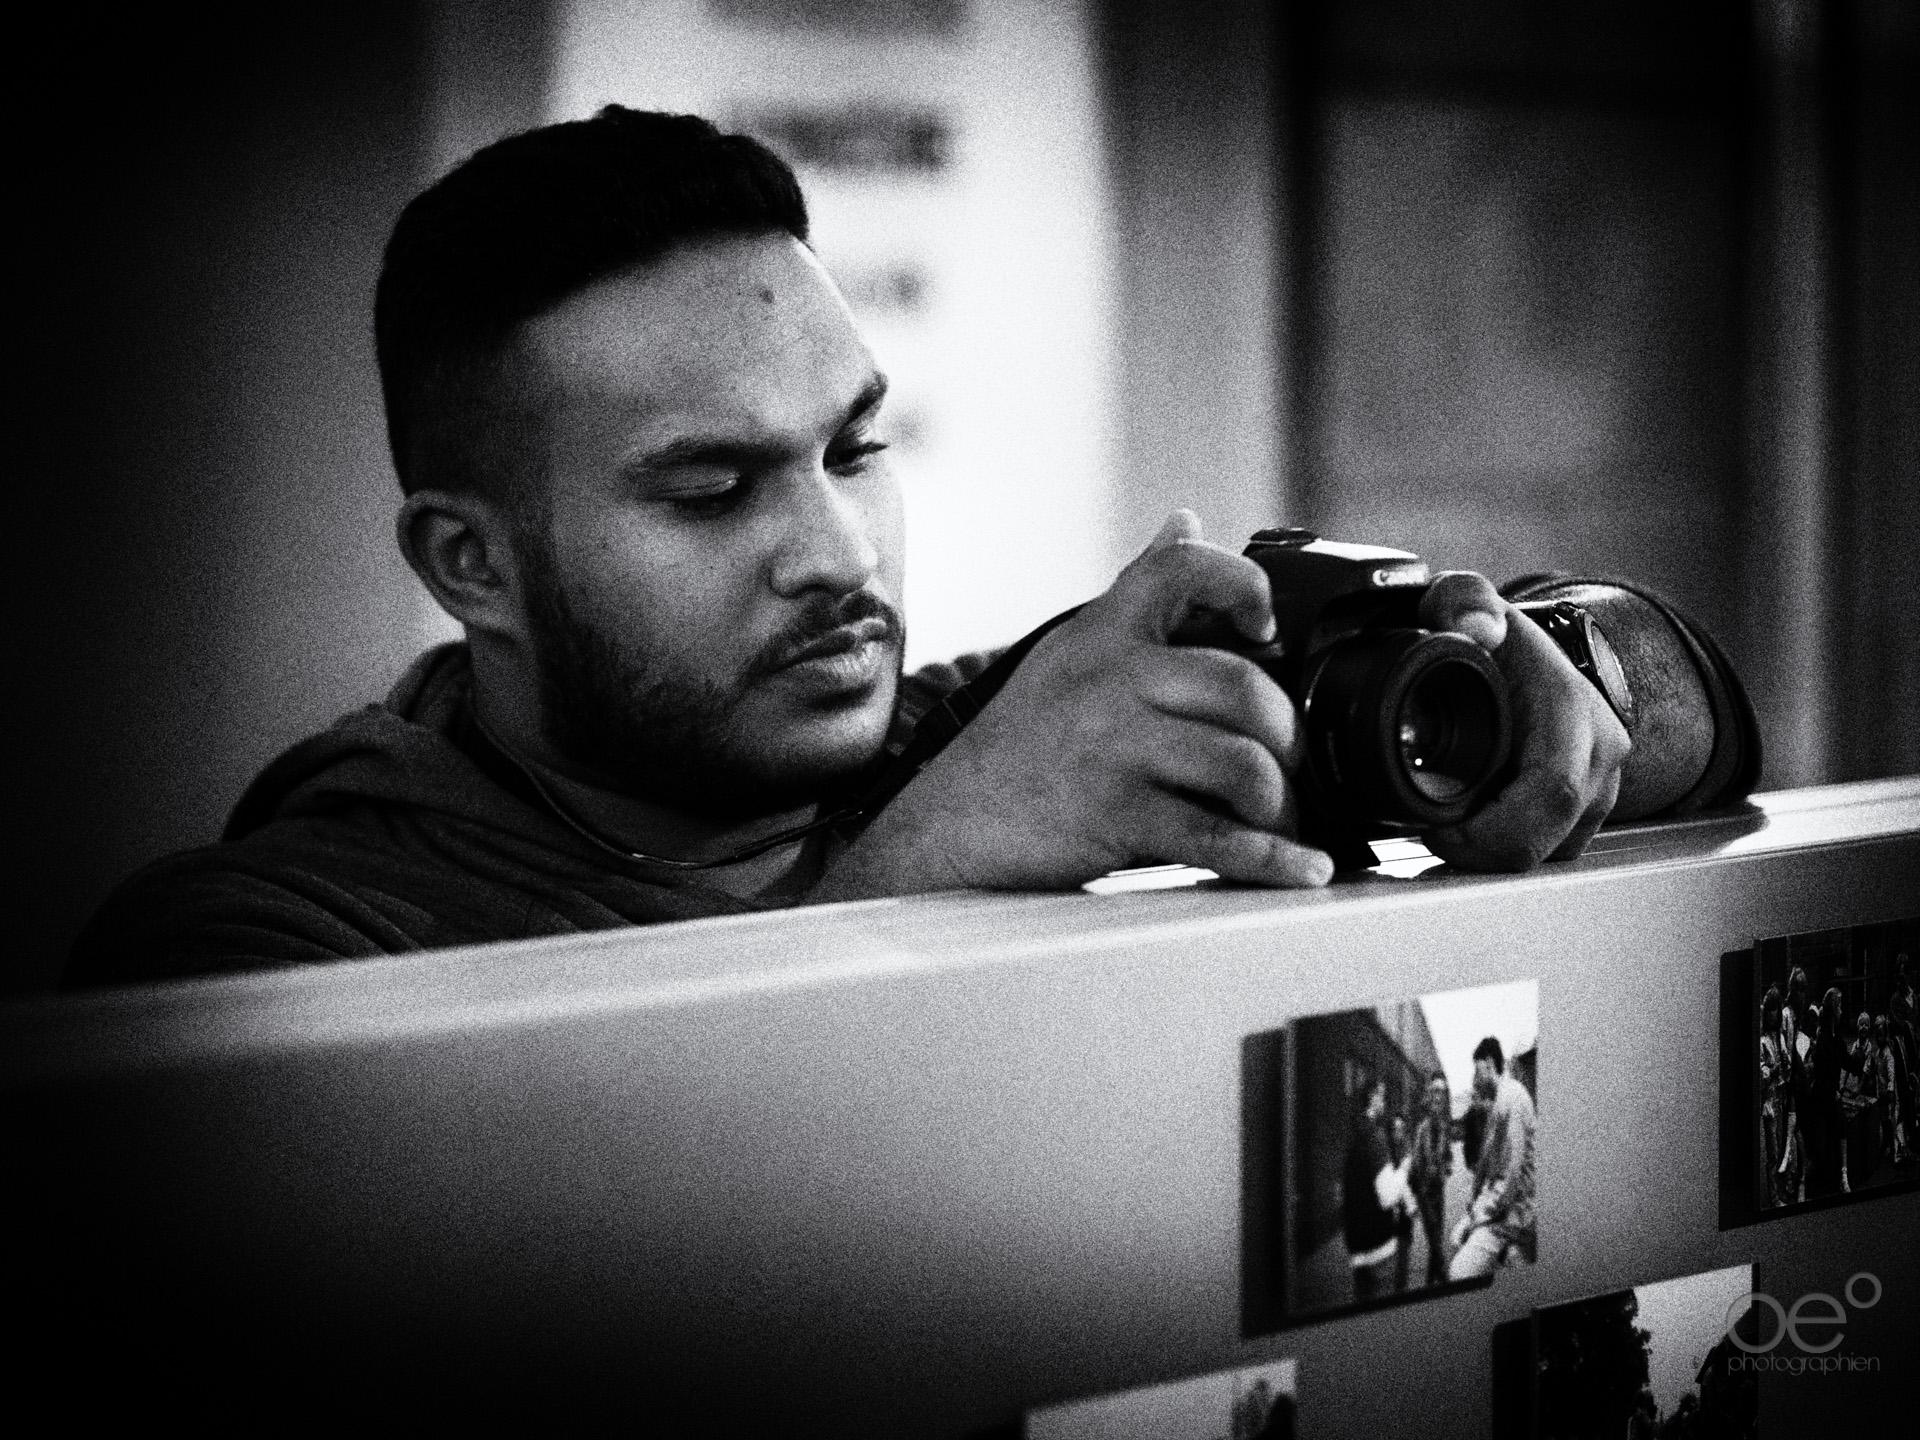 photobattle - side shots